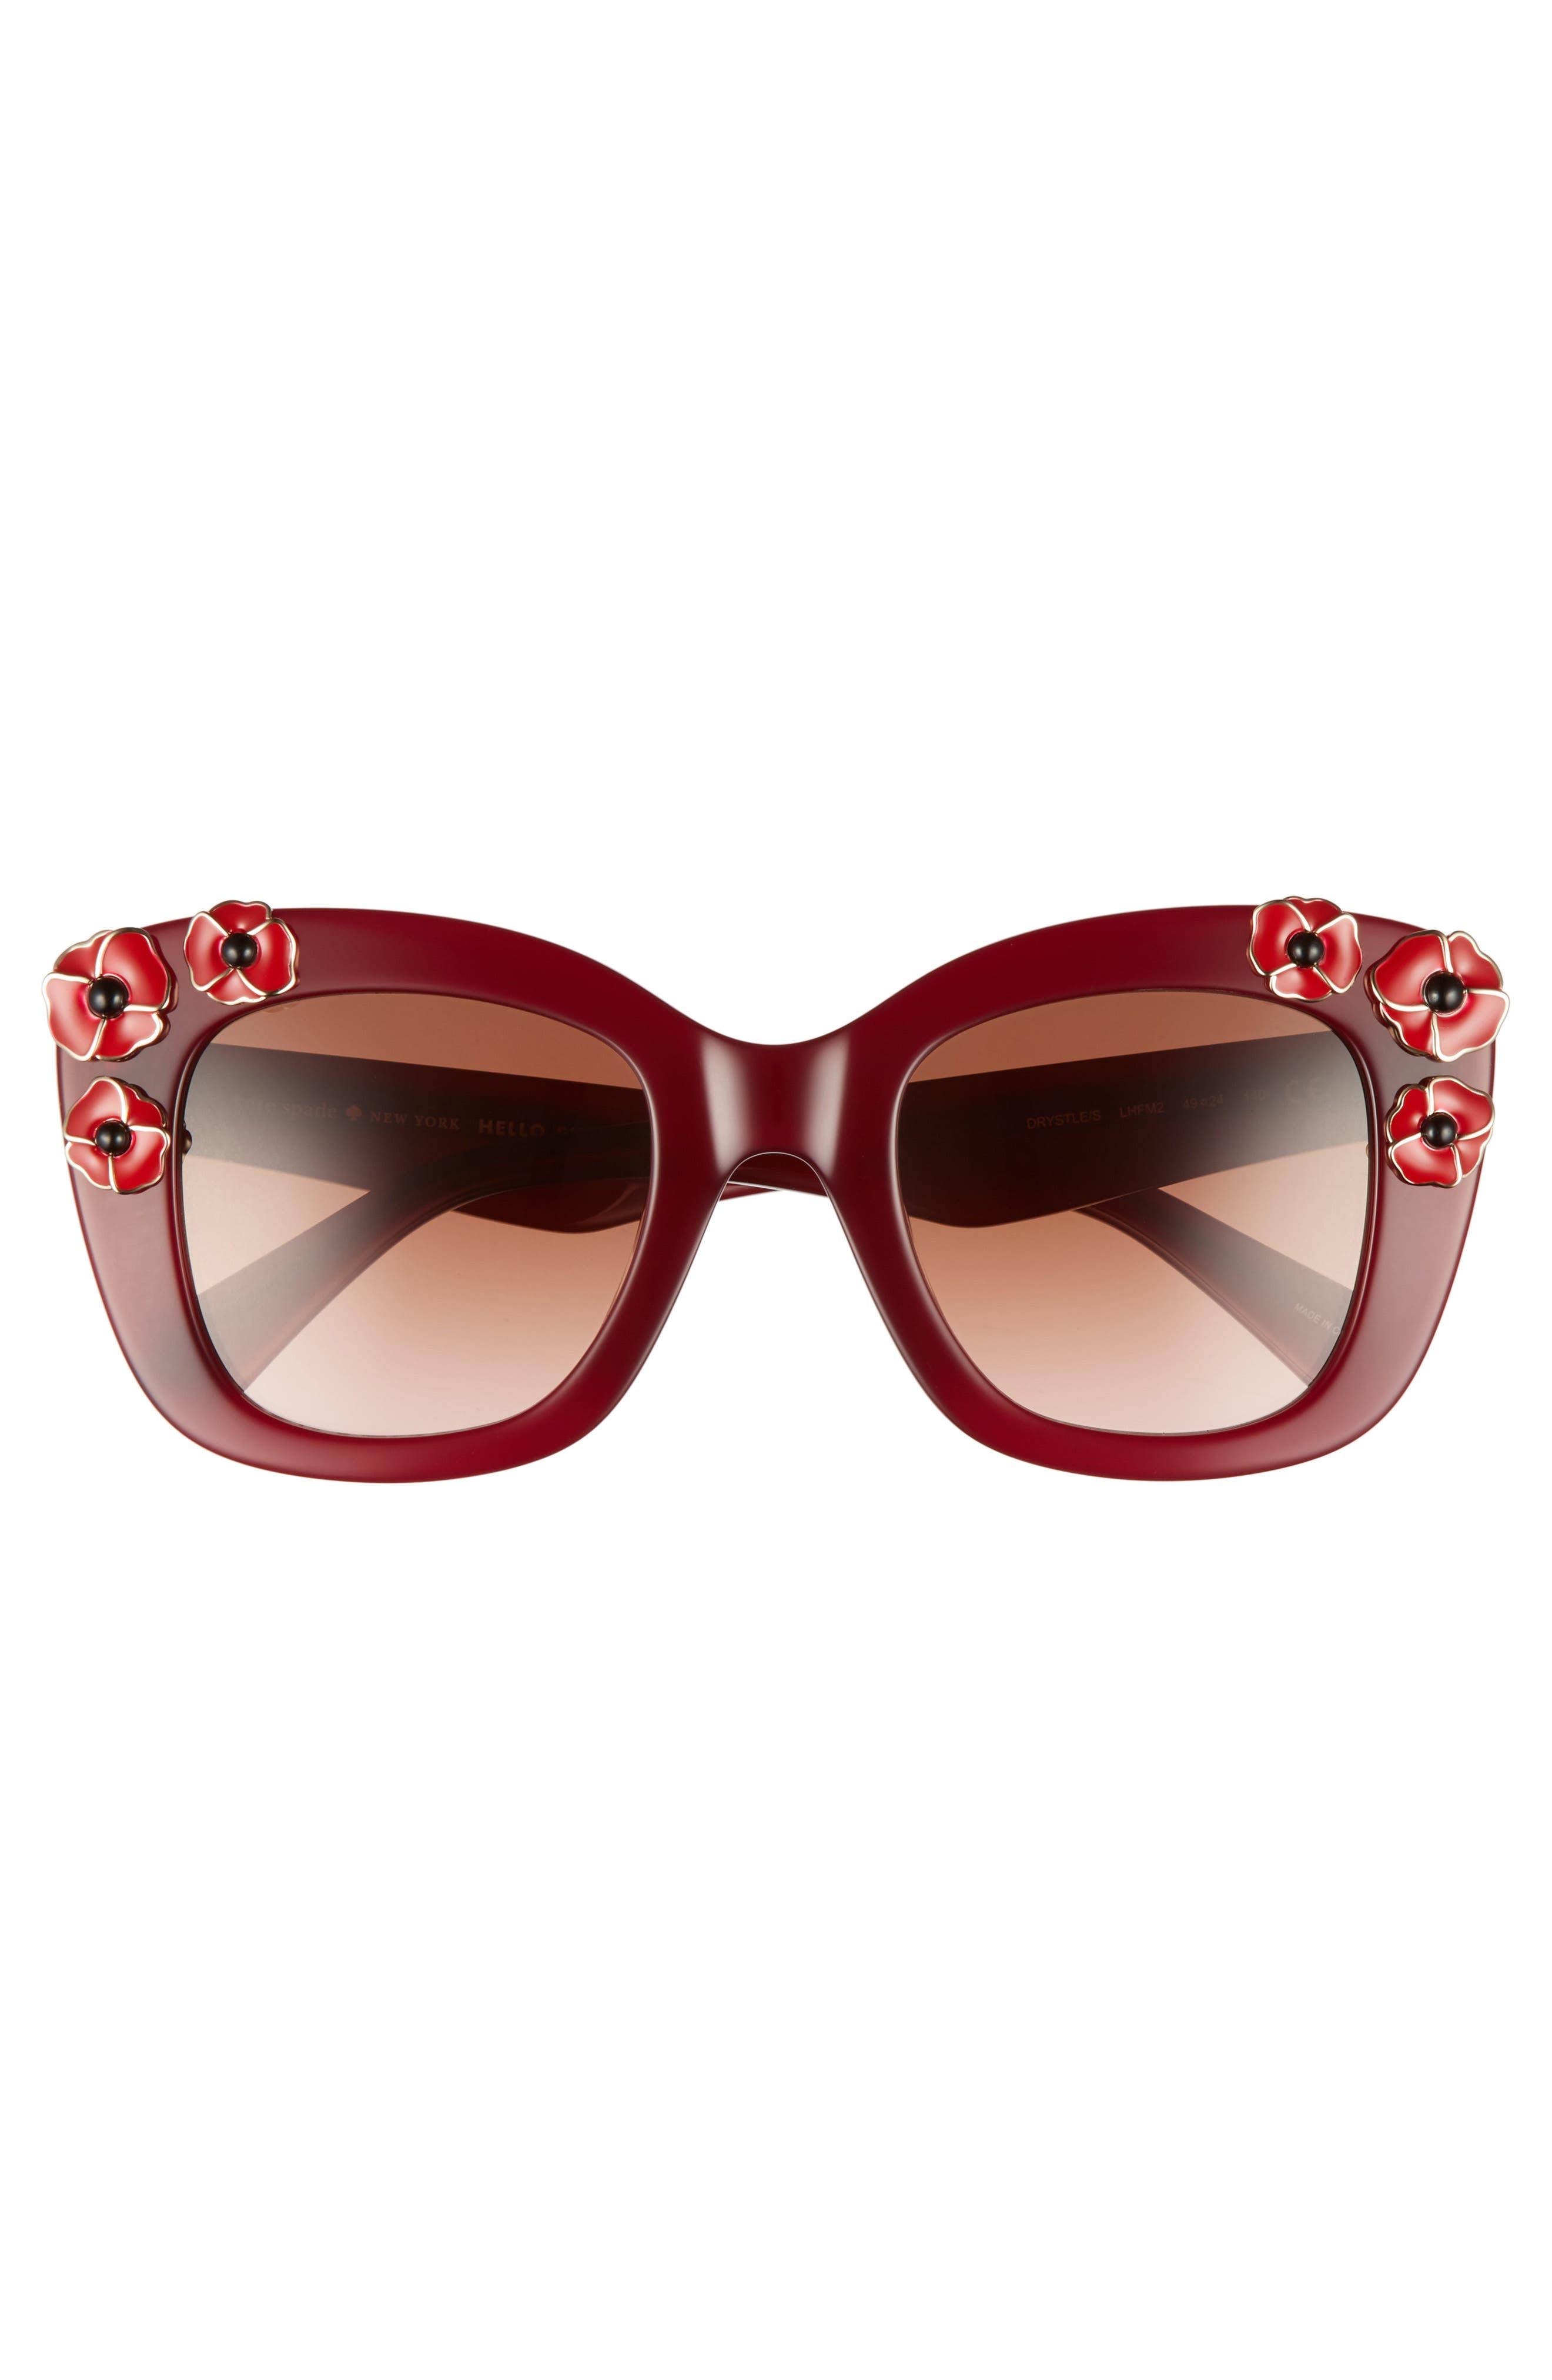 kate spade drystle 49mm floral embellished square sunglasses,                             Alternate thumbnail 6, color,